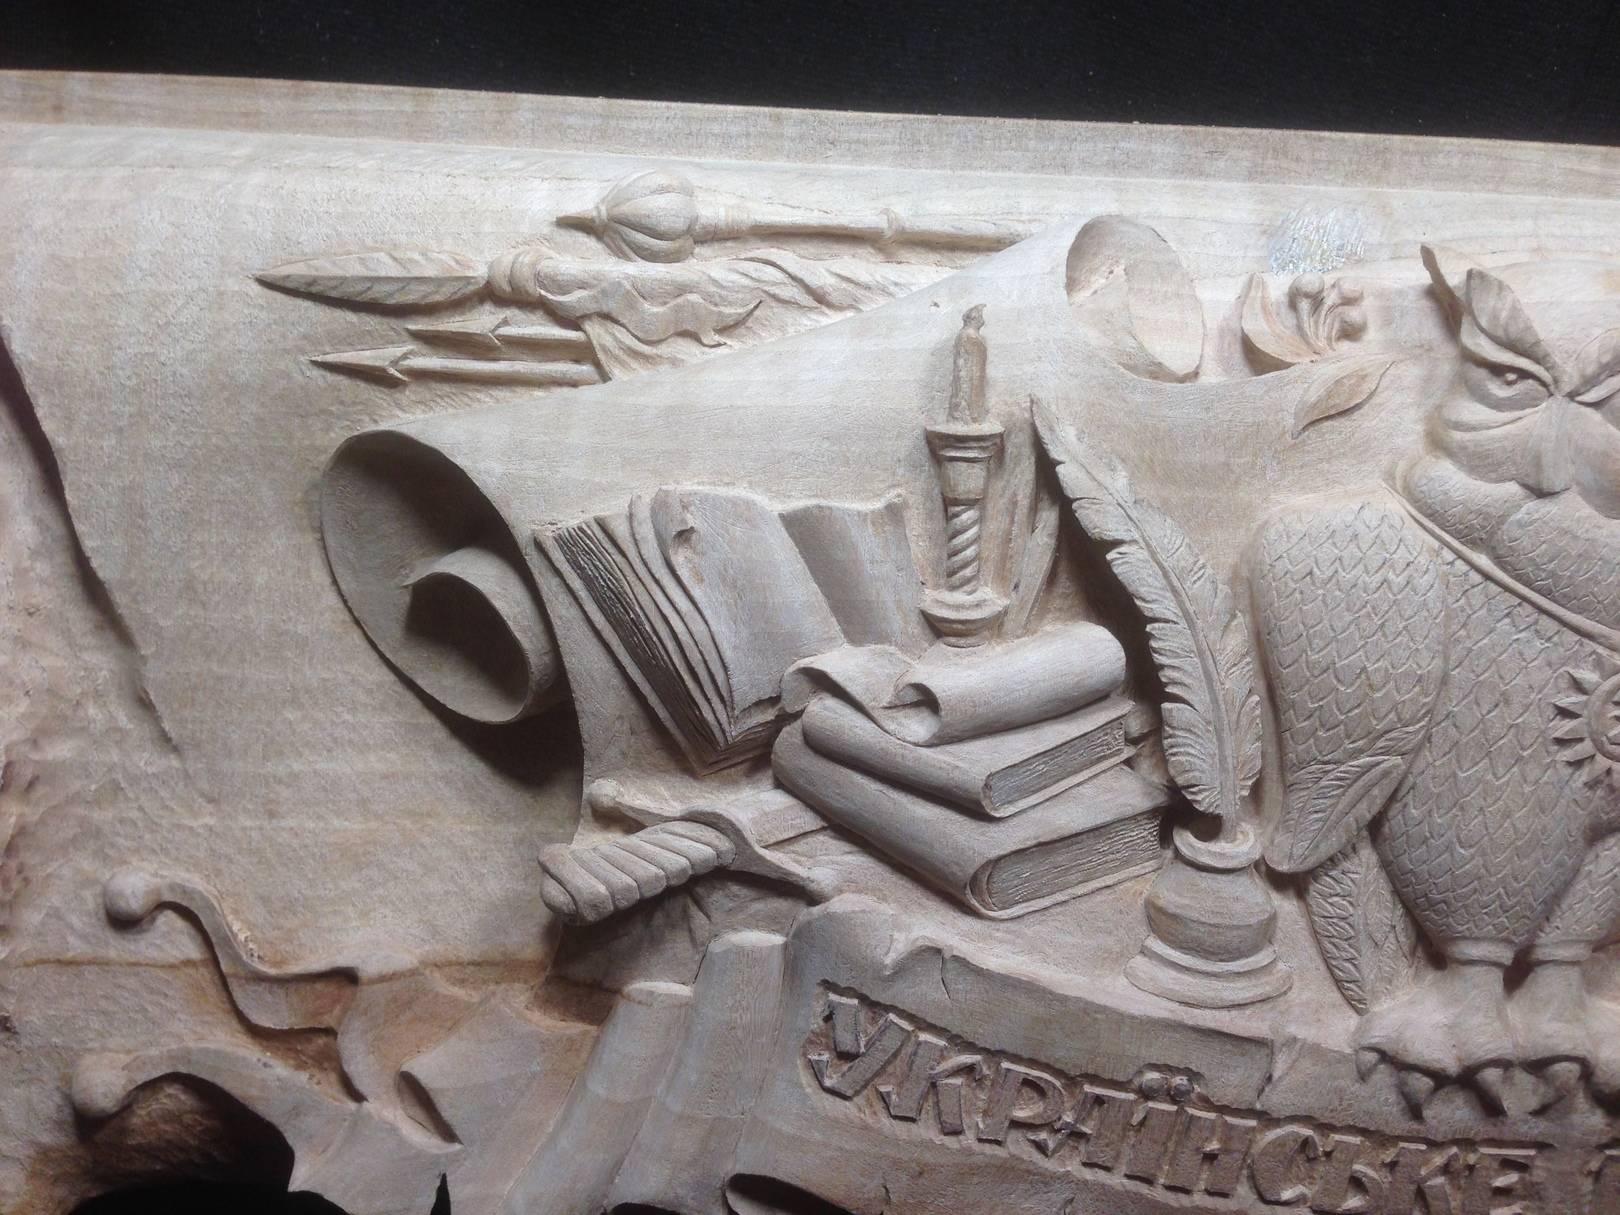 ЦЕНТРАЛЬНЫЙ СЮЖЕТ. (Фрагмент, левая сторона ). Высота всех сюжетов: 130 мм. ( Height of all works: 130 см.) Material: Pear – tree (дикая груша). Madehand.